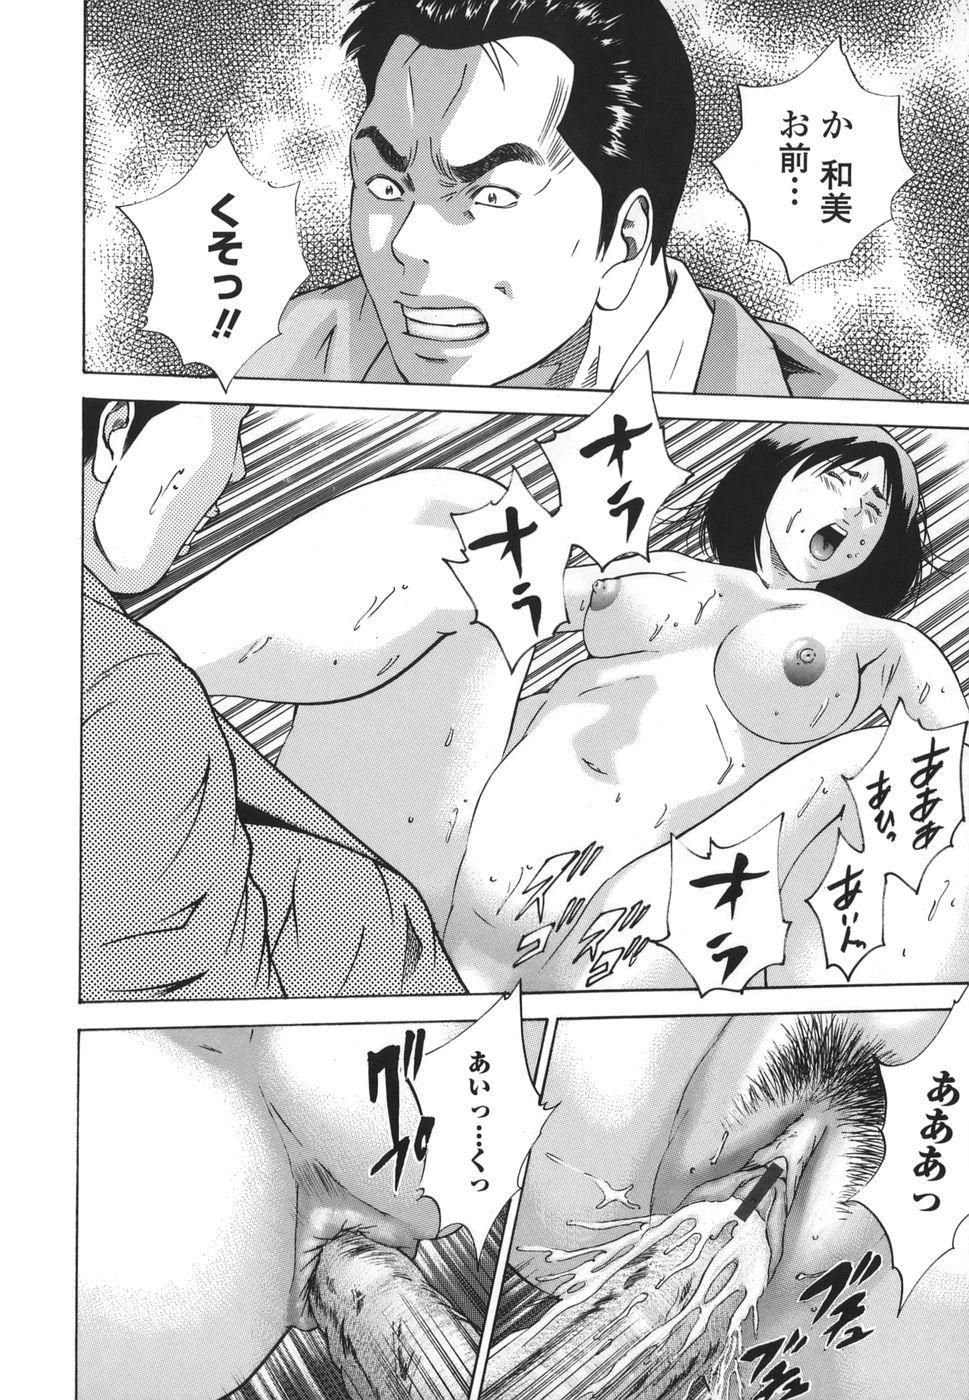 Kinshin Goukan - Near Relation Rapes 123